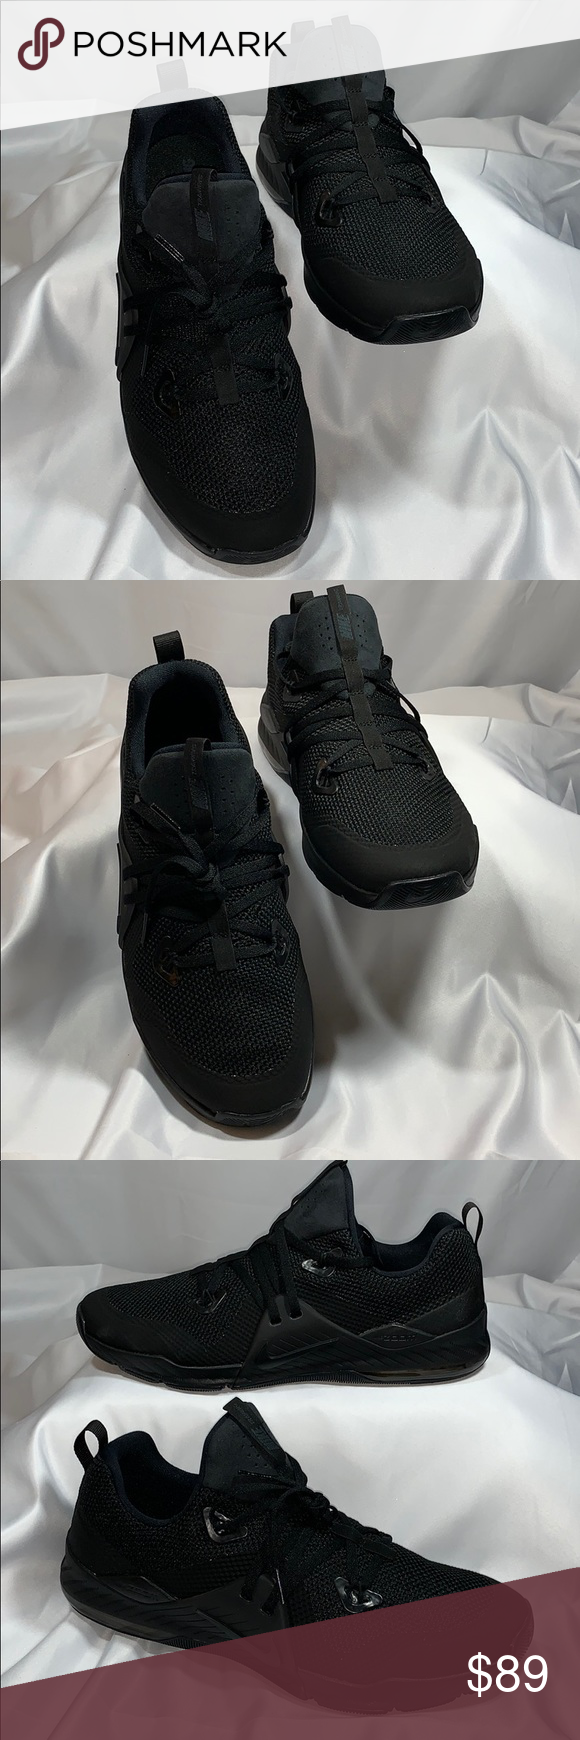 cc0f3a026b4c Nike Zoom Train Command Men s Training Shoes Black Nike Zoom Train Command  Men s Training Shoes